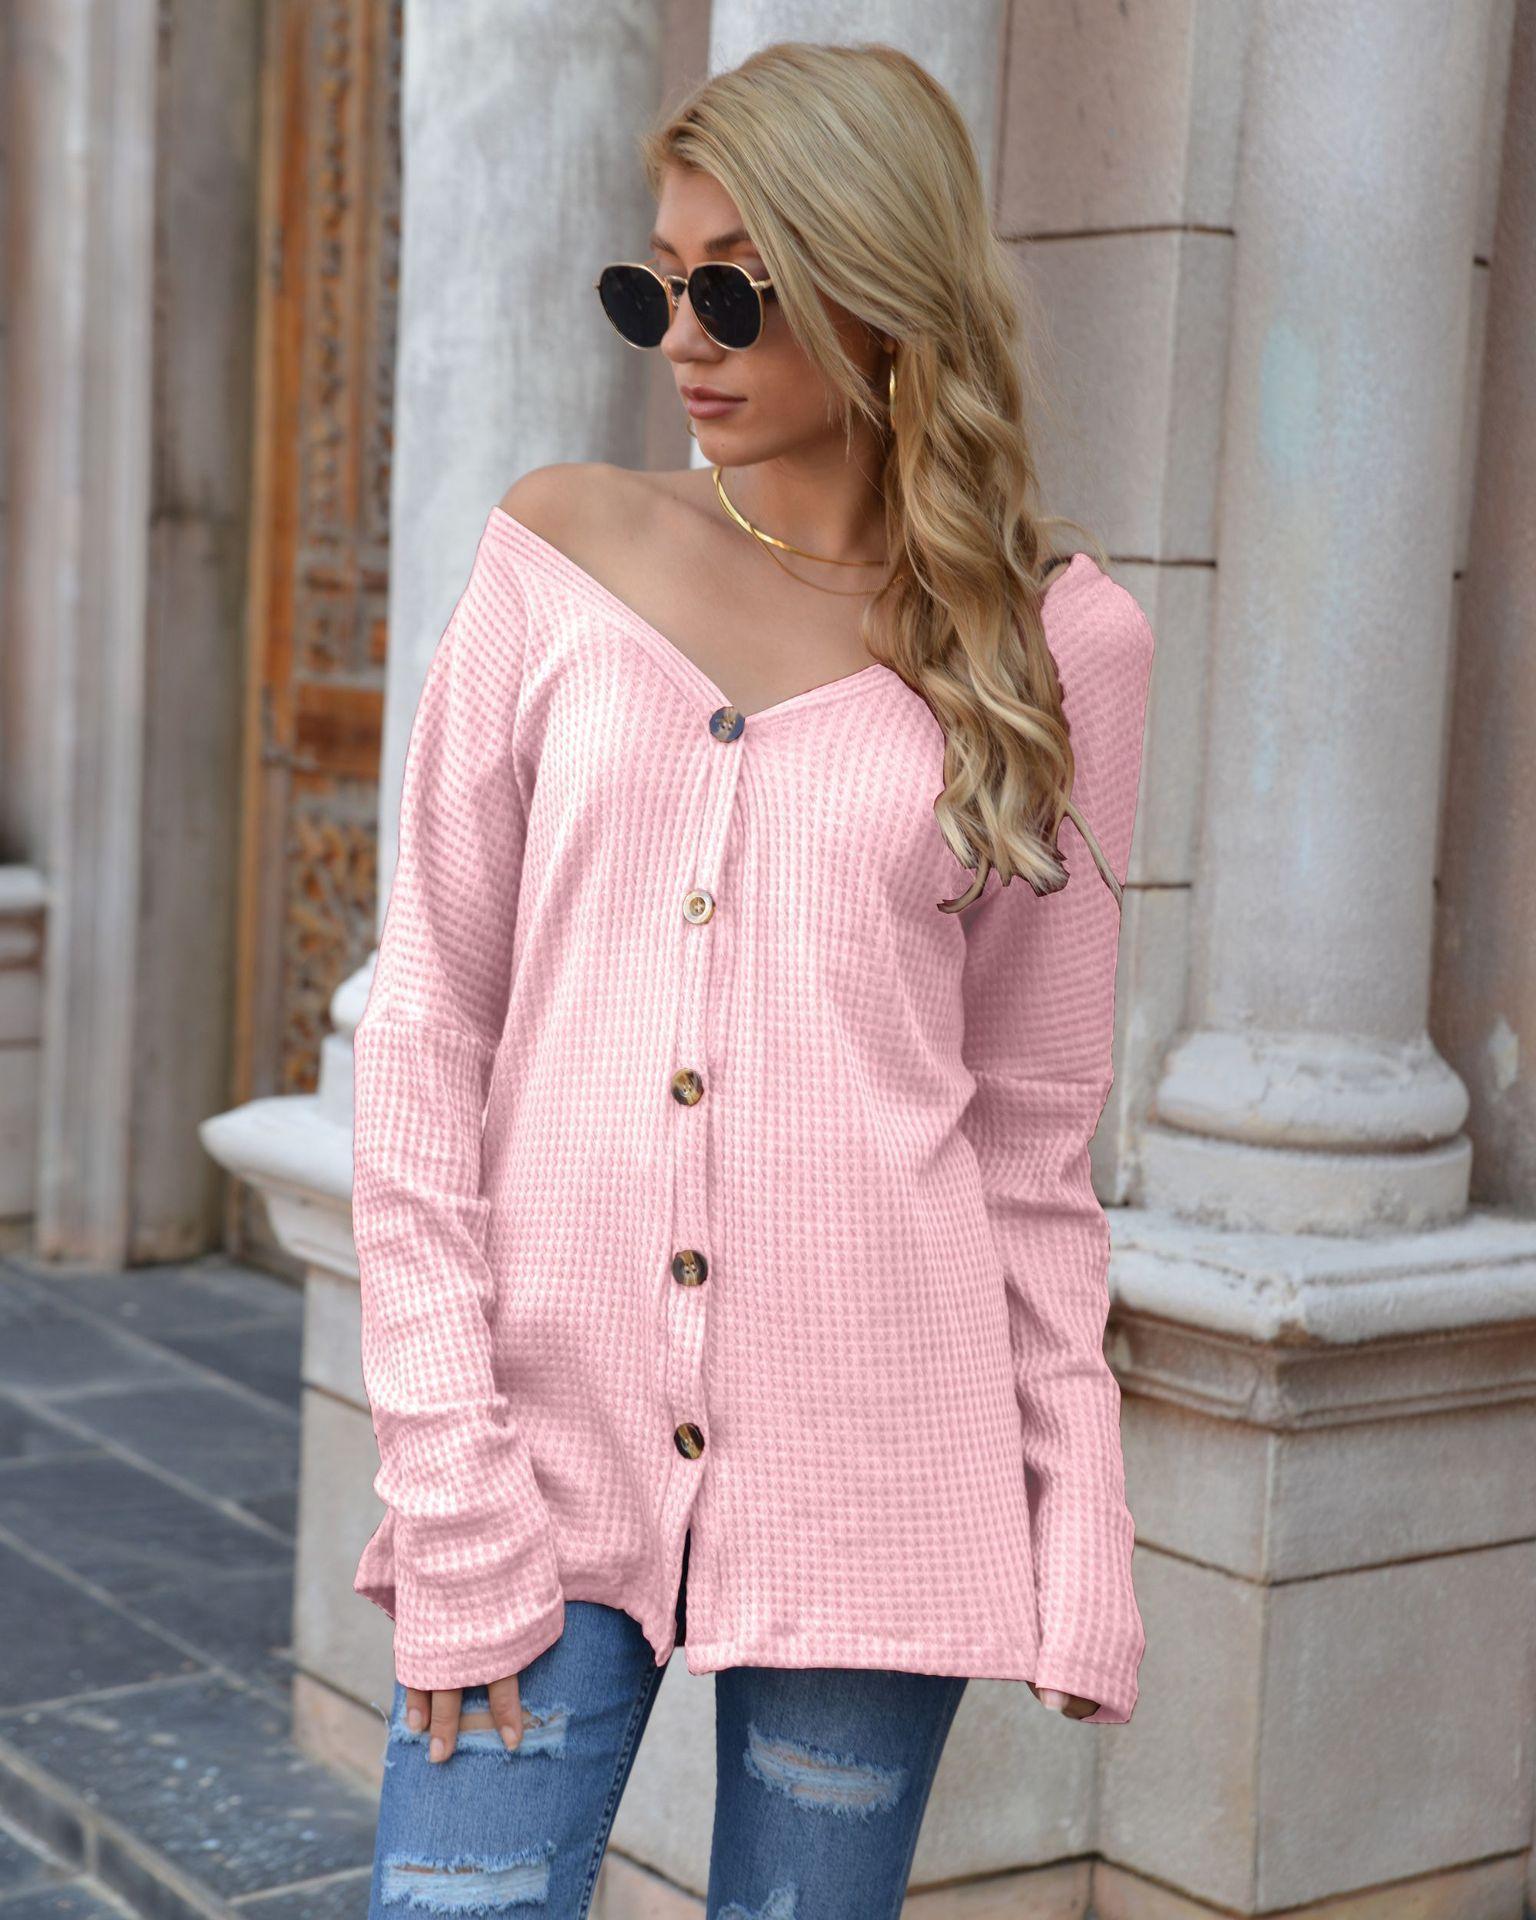 Womens Designer Pullover Mode Strick Weibliche Kleidung Herbst-Winter-lange Hülse V-Ausschnitt Solid Color Pullover